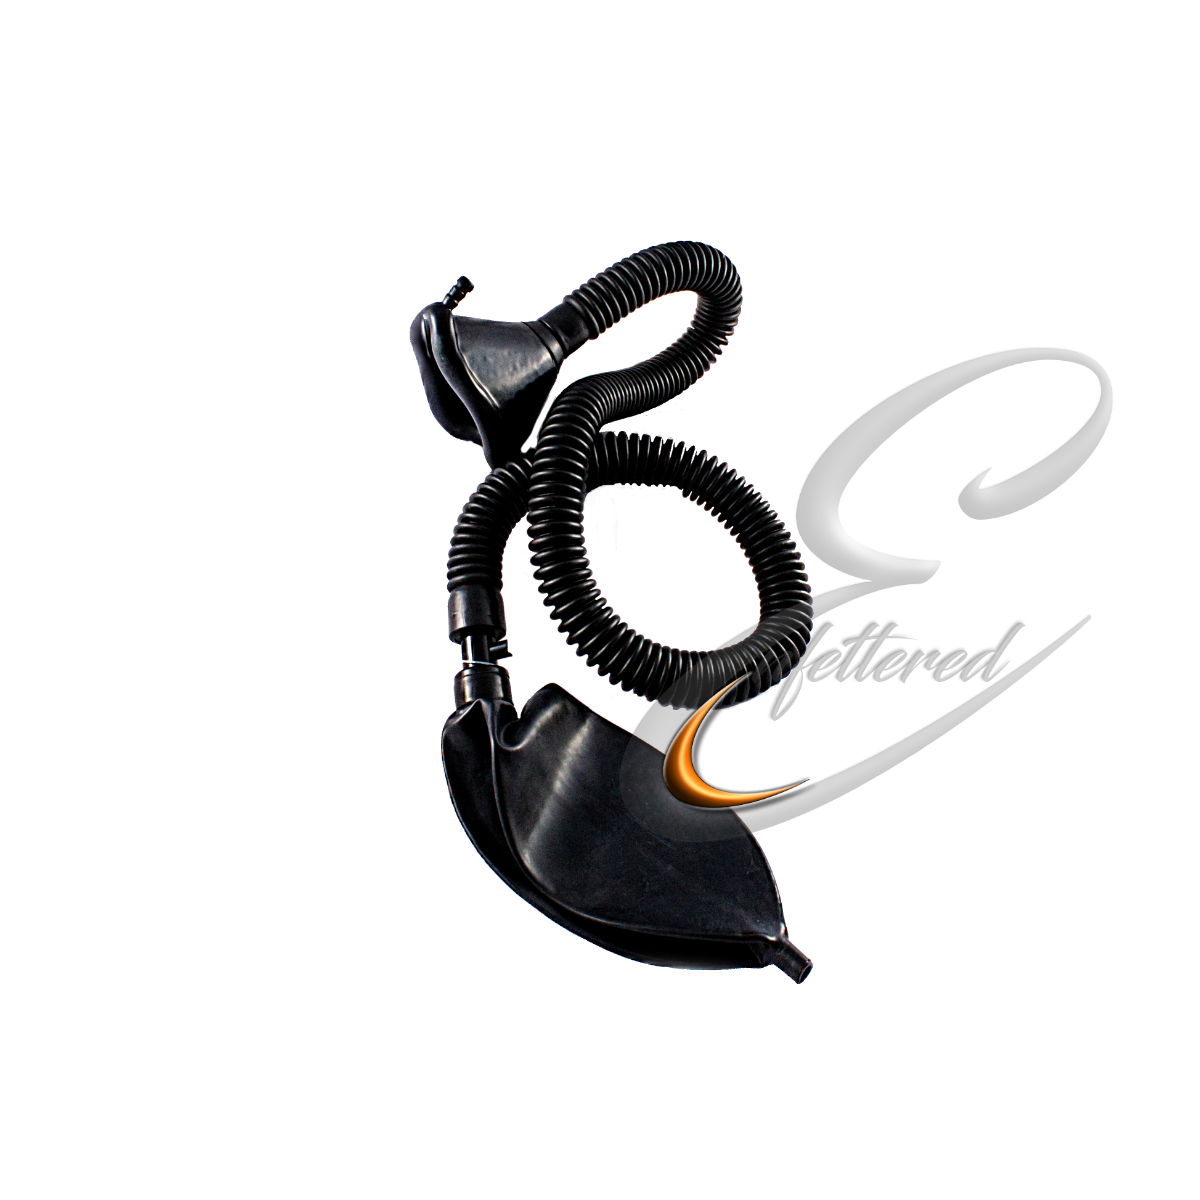 Enfettered Respirator Mask System